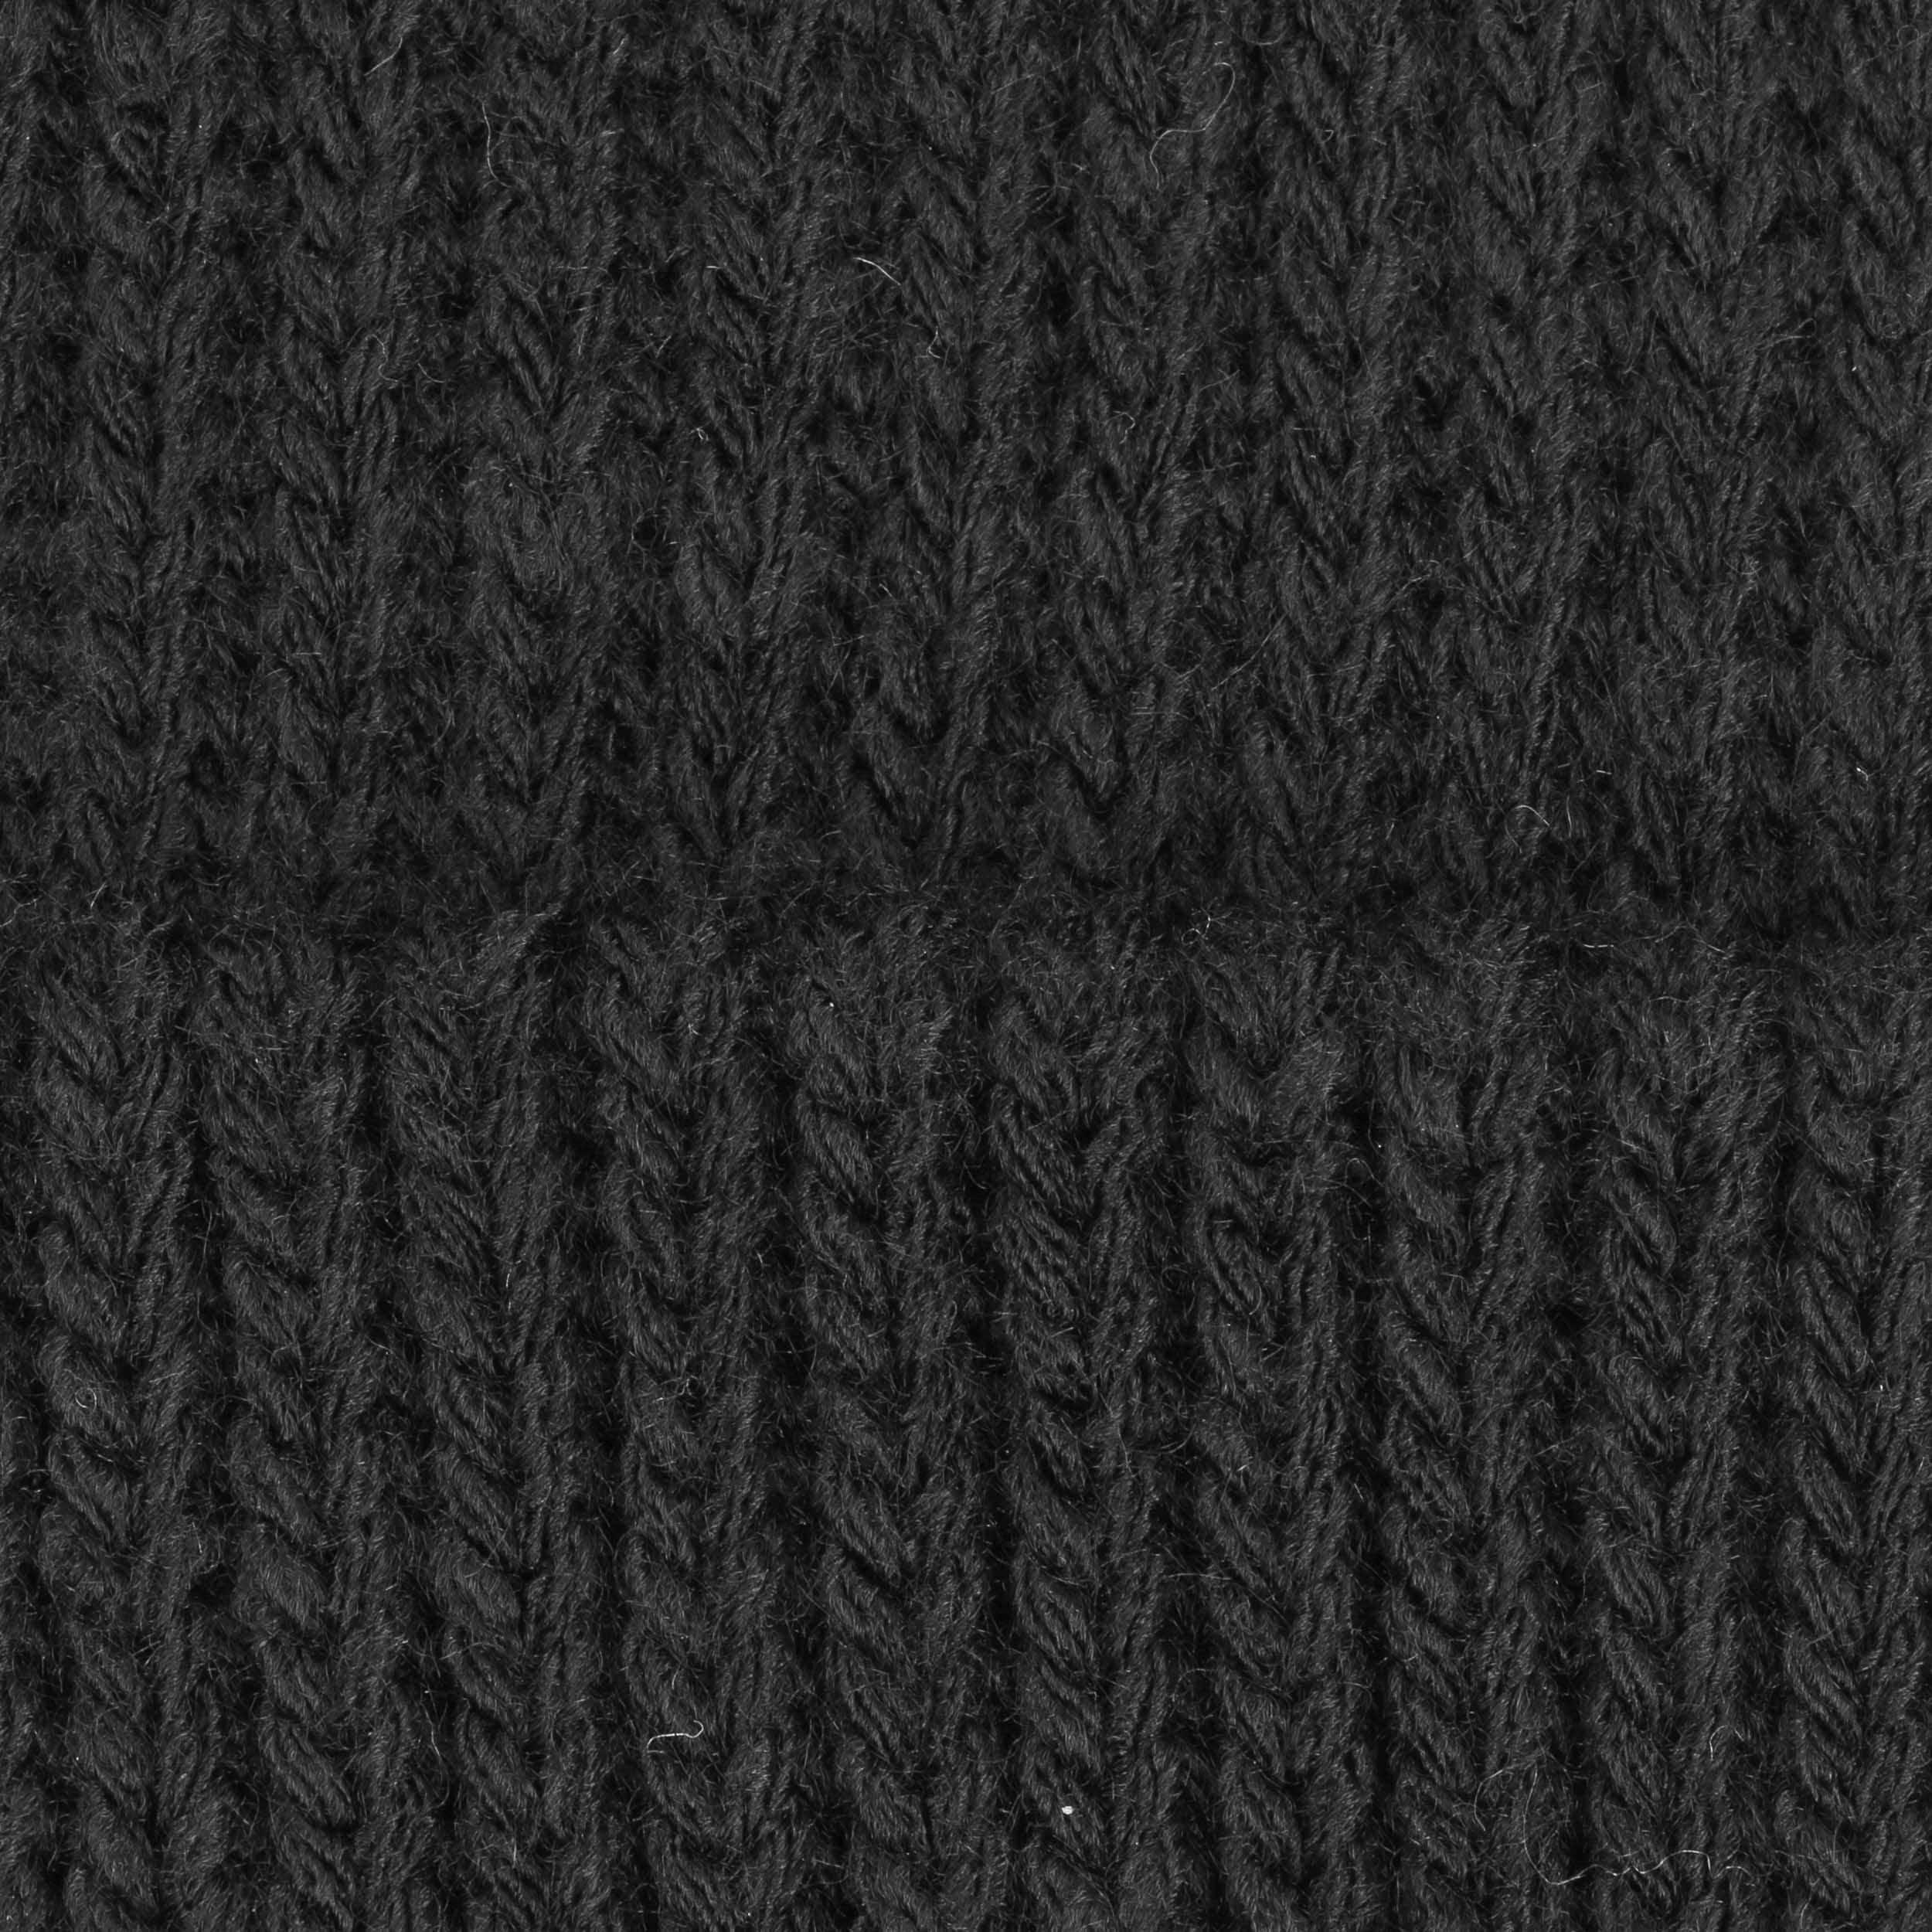 300afea6b33de Gorro Beanie Mini Full Patch by Vans - Gorros - sombreroshop.es